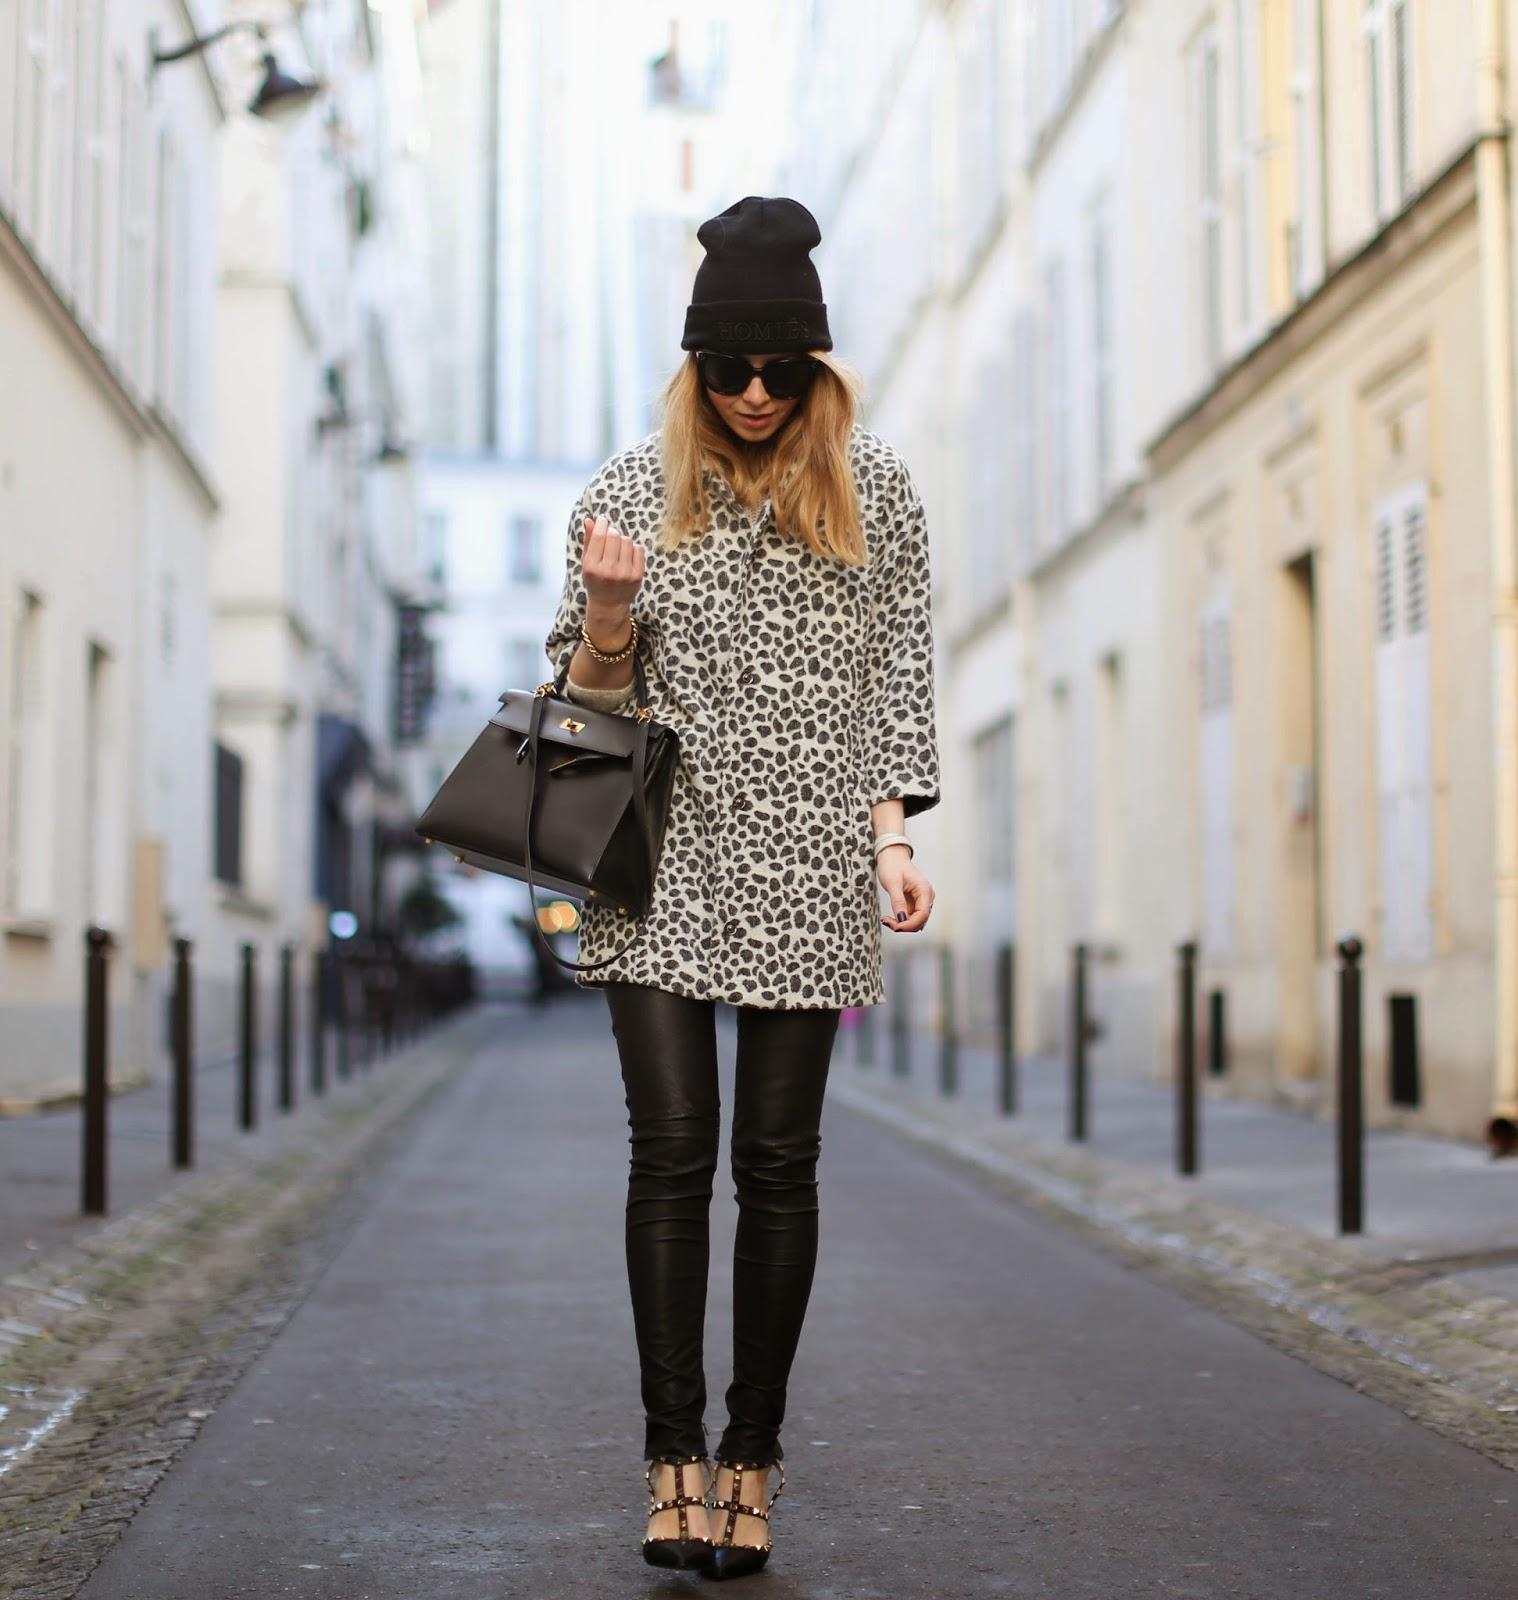 leopard, leopard coat, valentino rockstuds, blkdnm, leather pants, homies, hermès kelly, streetstyle